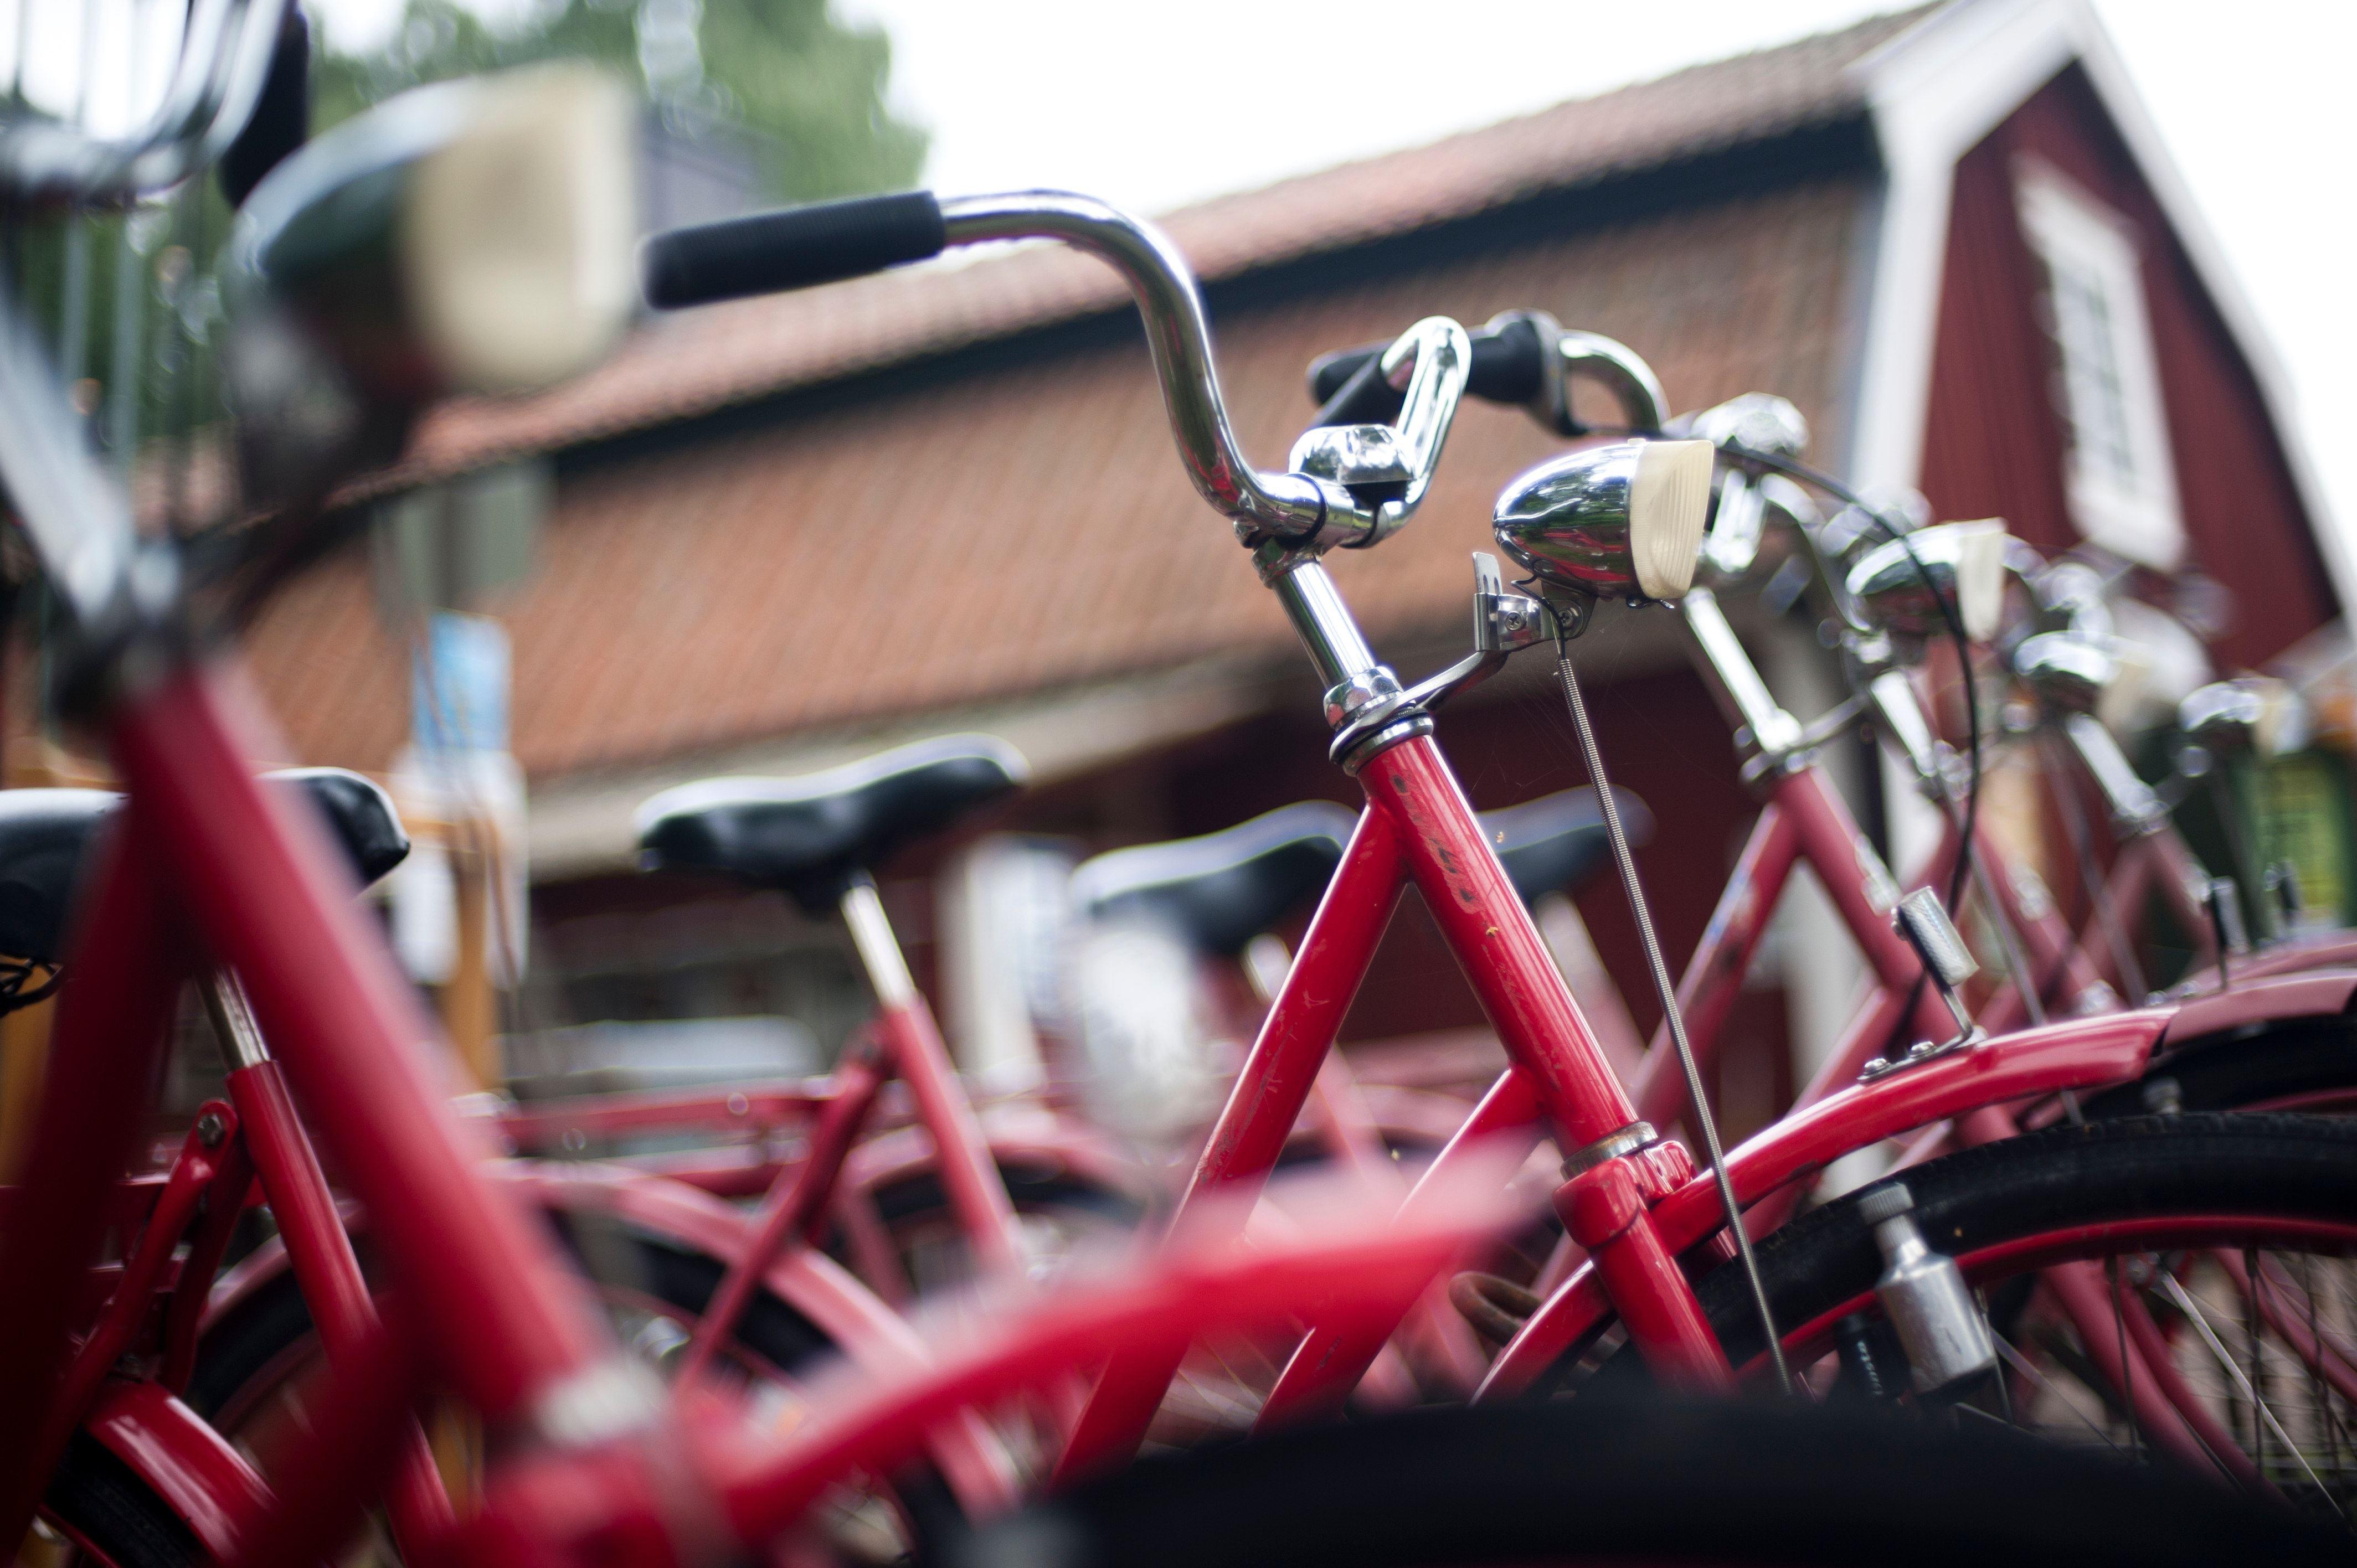 Cykeluthyrning Cykel och Motor AB i Ryd